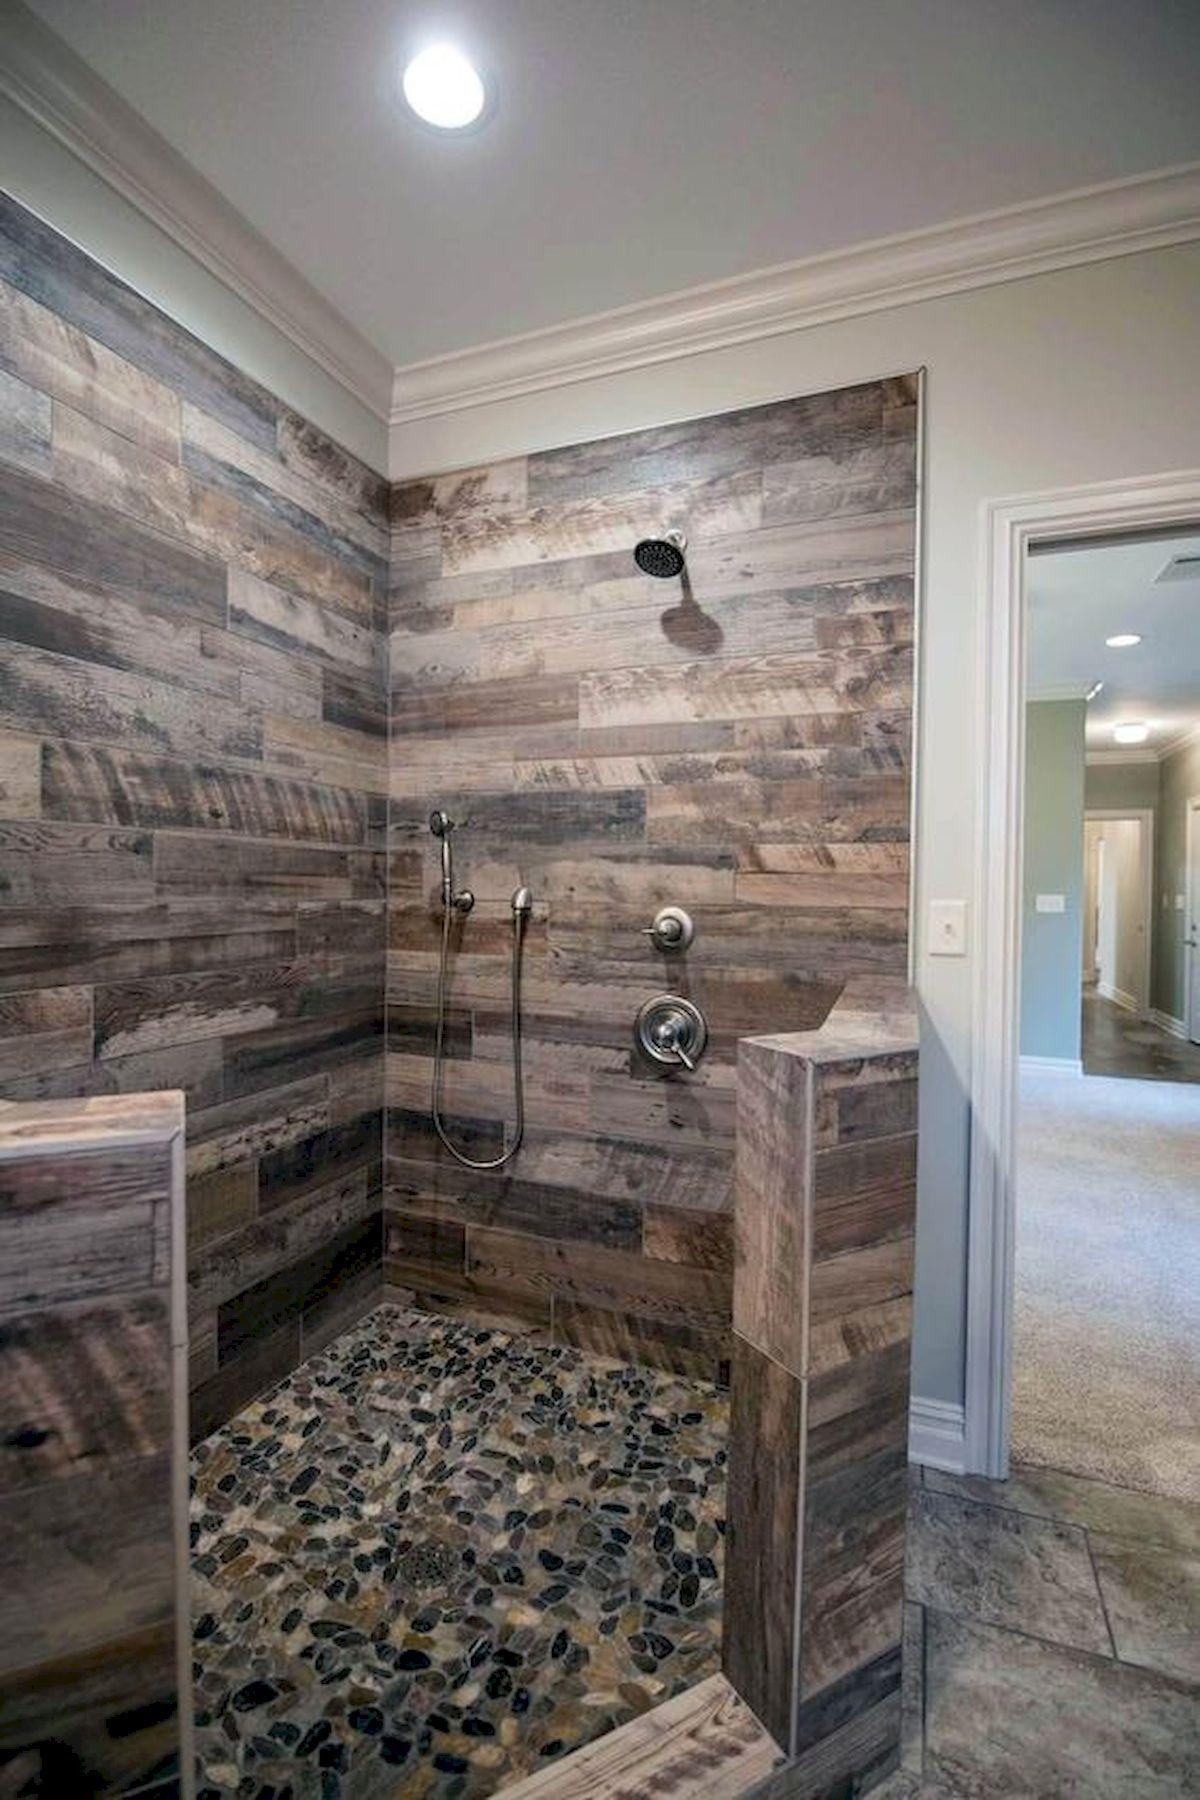 46 Fantastic Walk In Shower No Door for Bathroom Ideas 37 ...